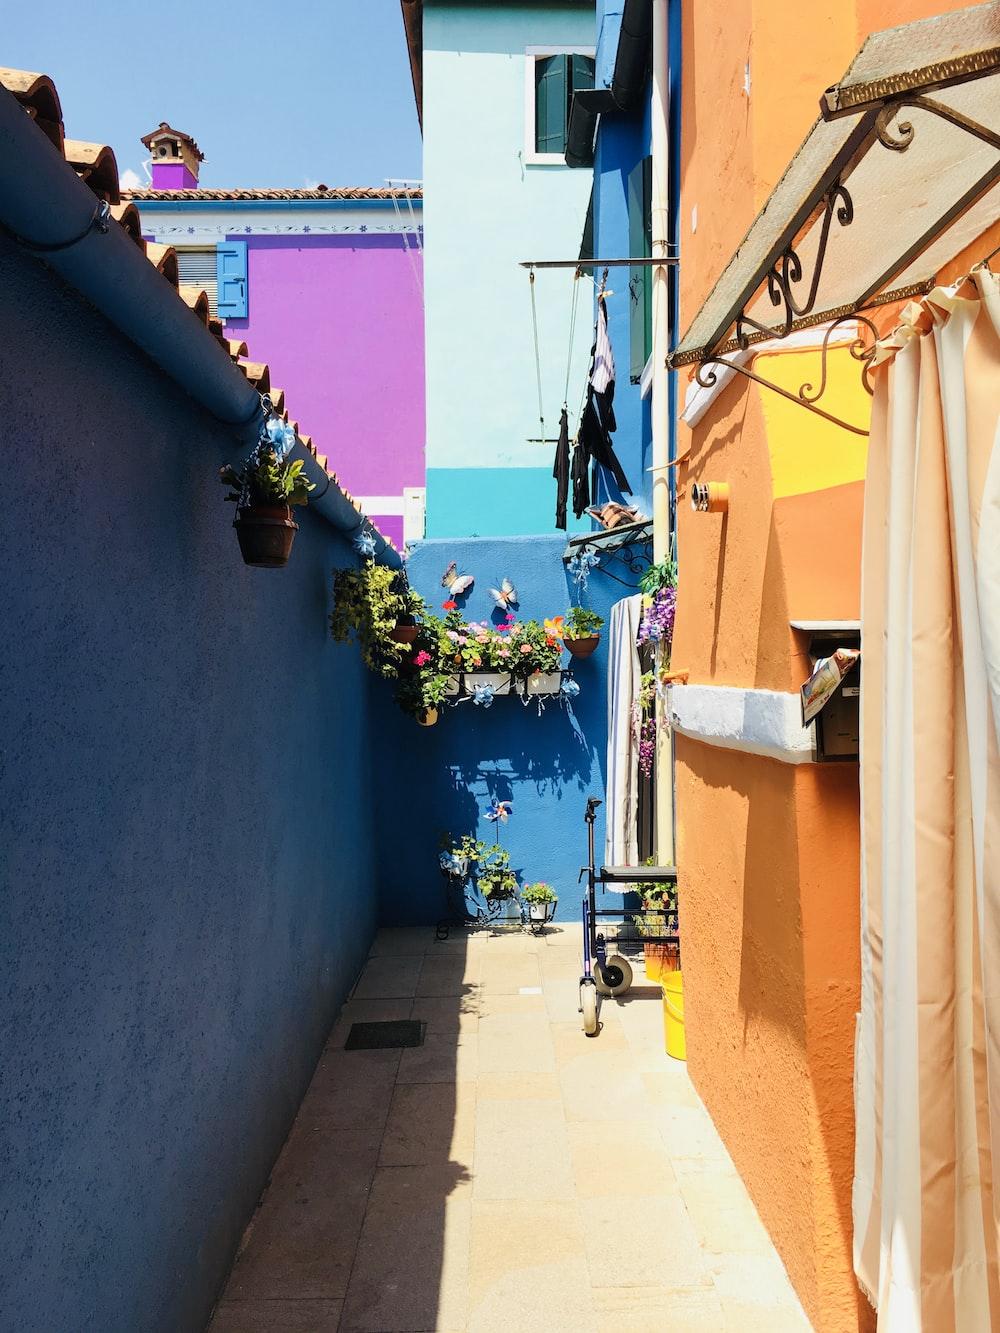 alley between blue and orange walls